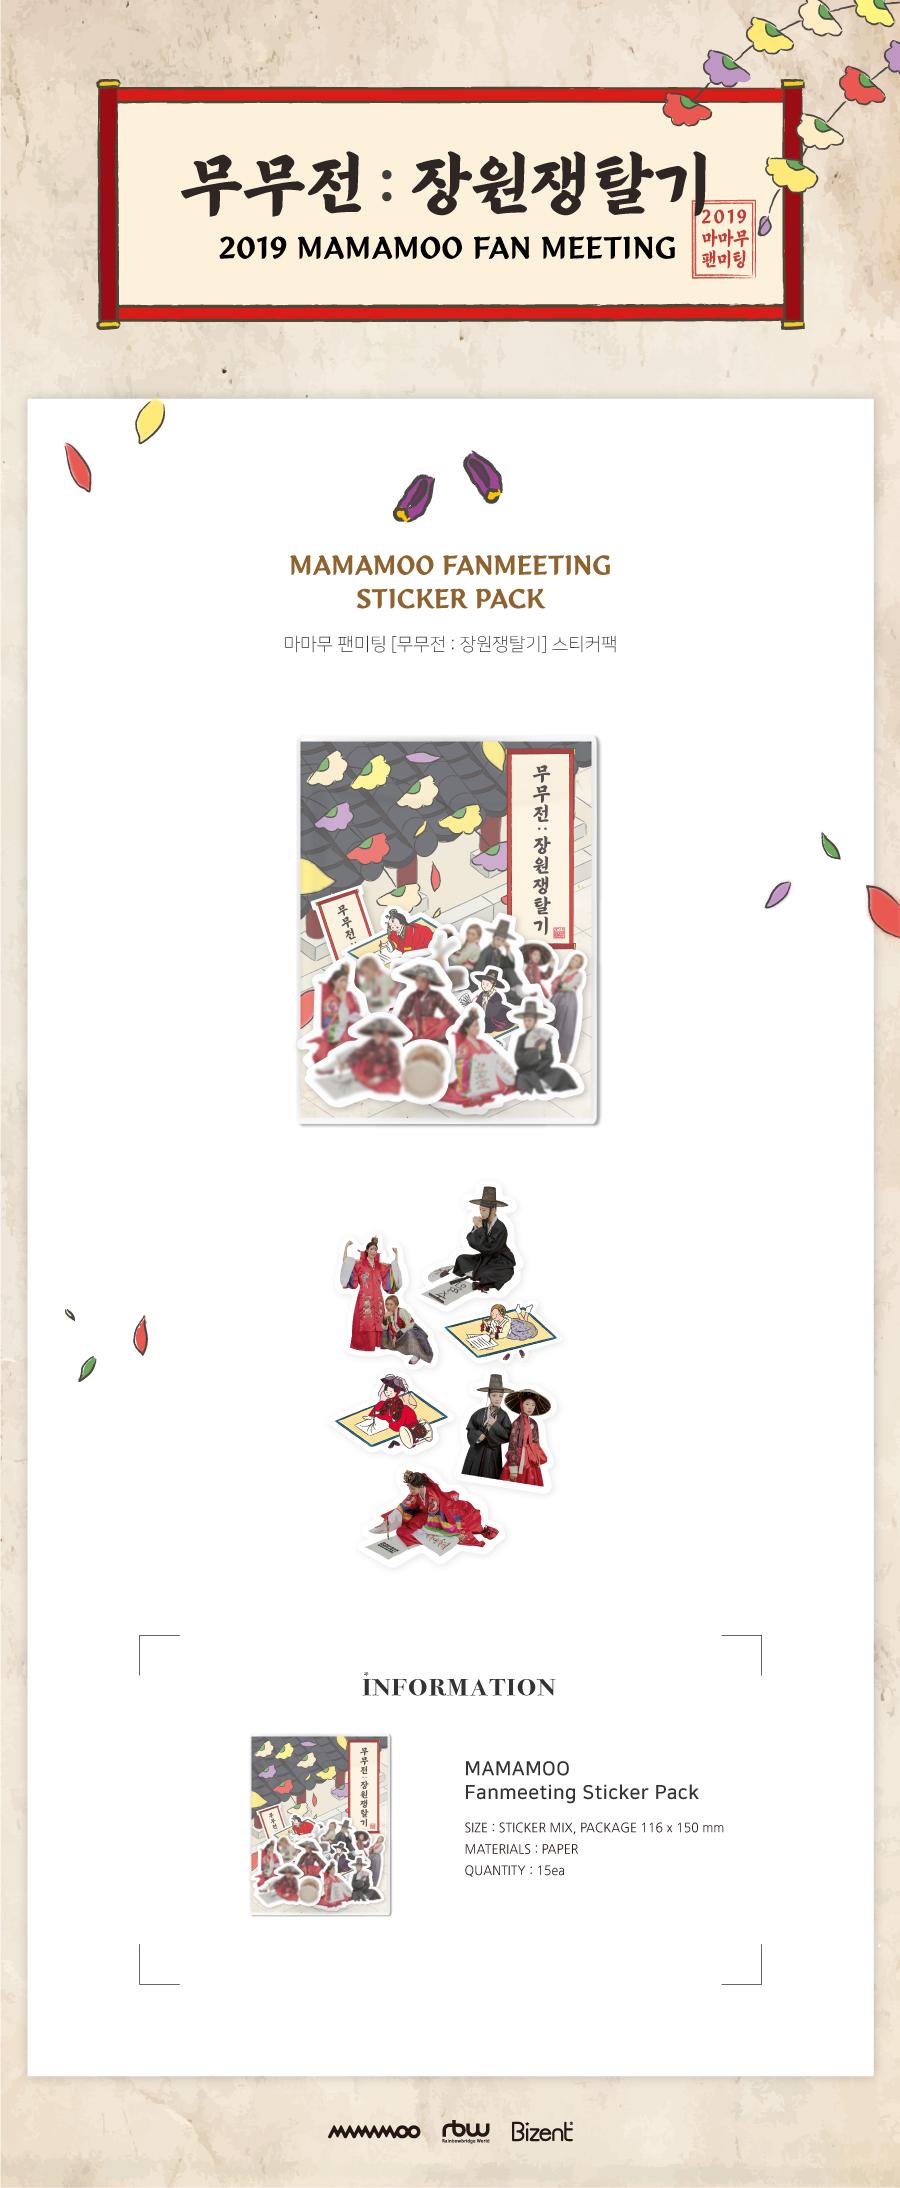 mamamoo_2019fan_stickerpack.jpg